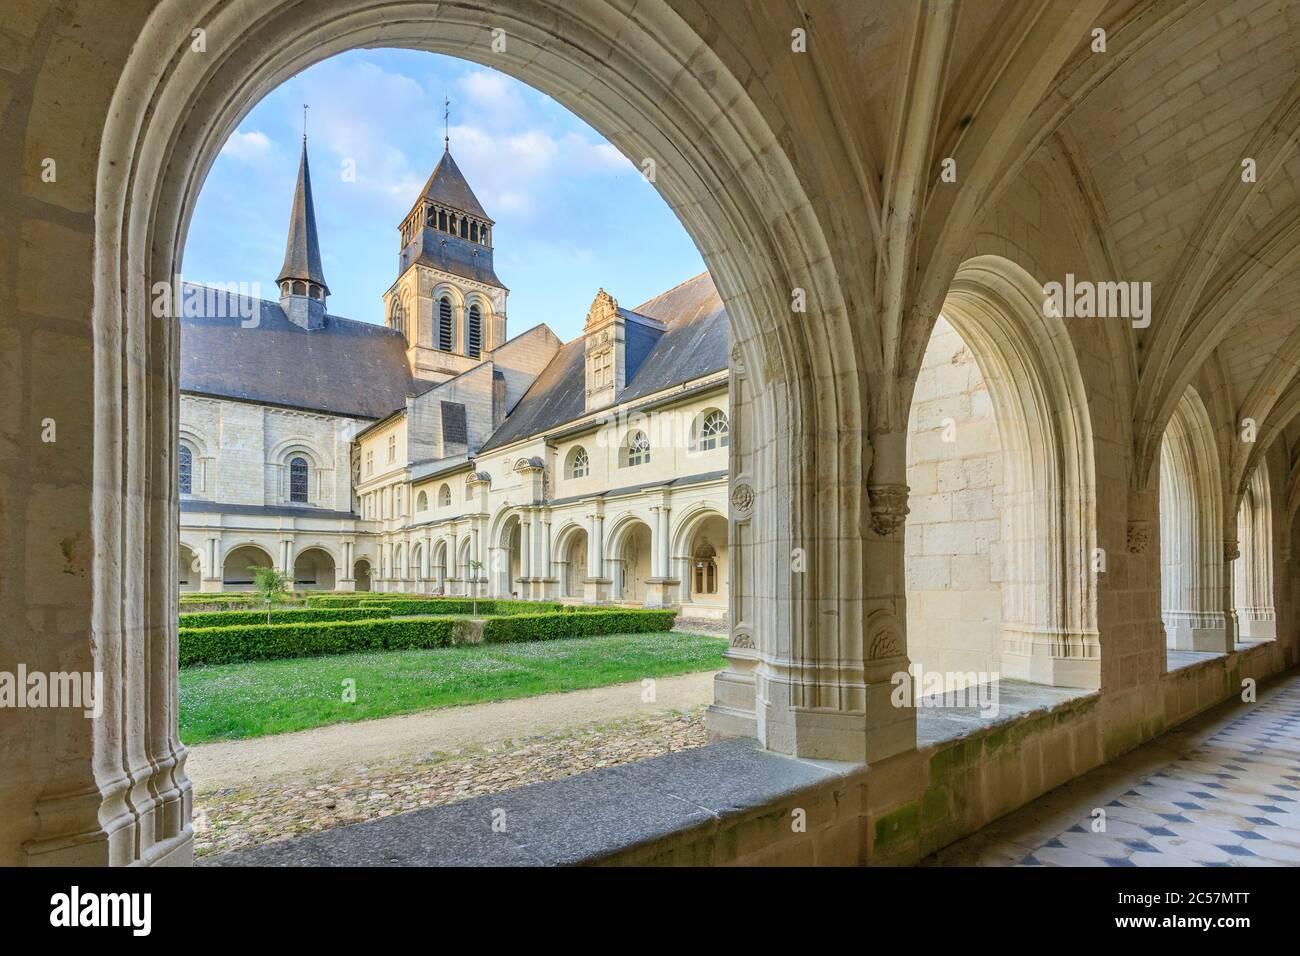 Francia, Maine y Loira, Loira Parque Natural Regional Anjou Touraine, Valle del Loira declarado Patrimonio de la Humanidad por la UNESCO, Fontevraud l'Abbaye, Notre Dame d Foto de stock